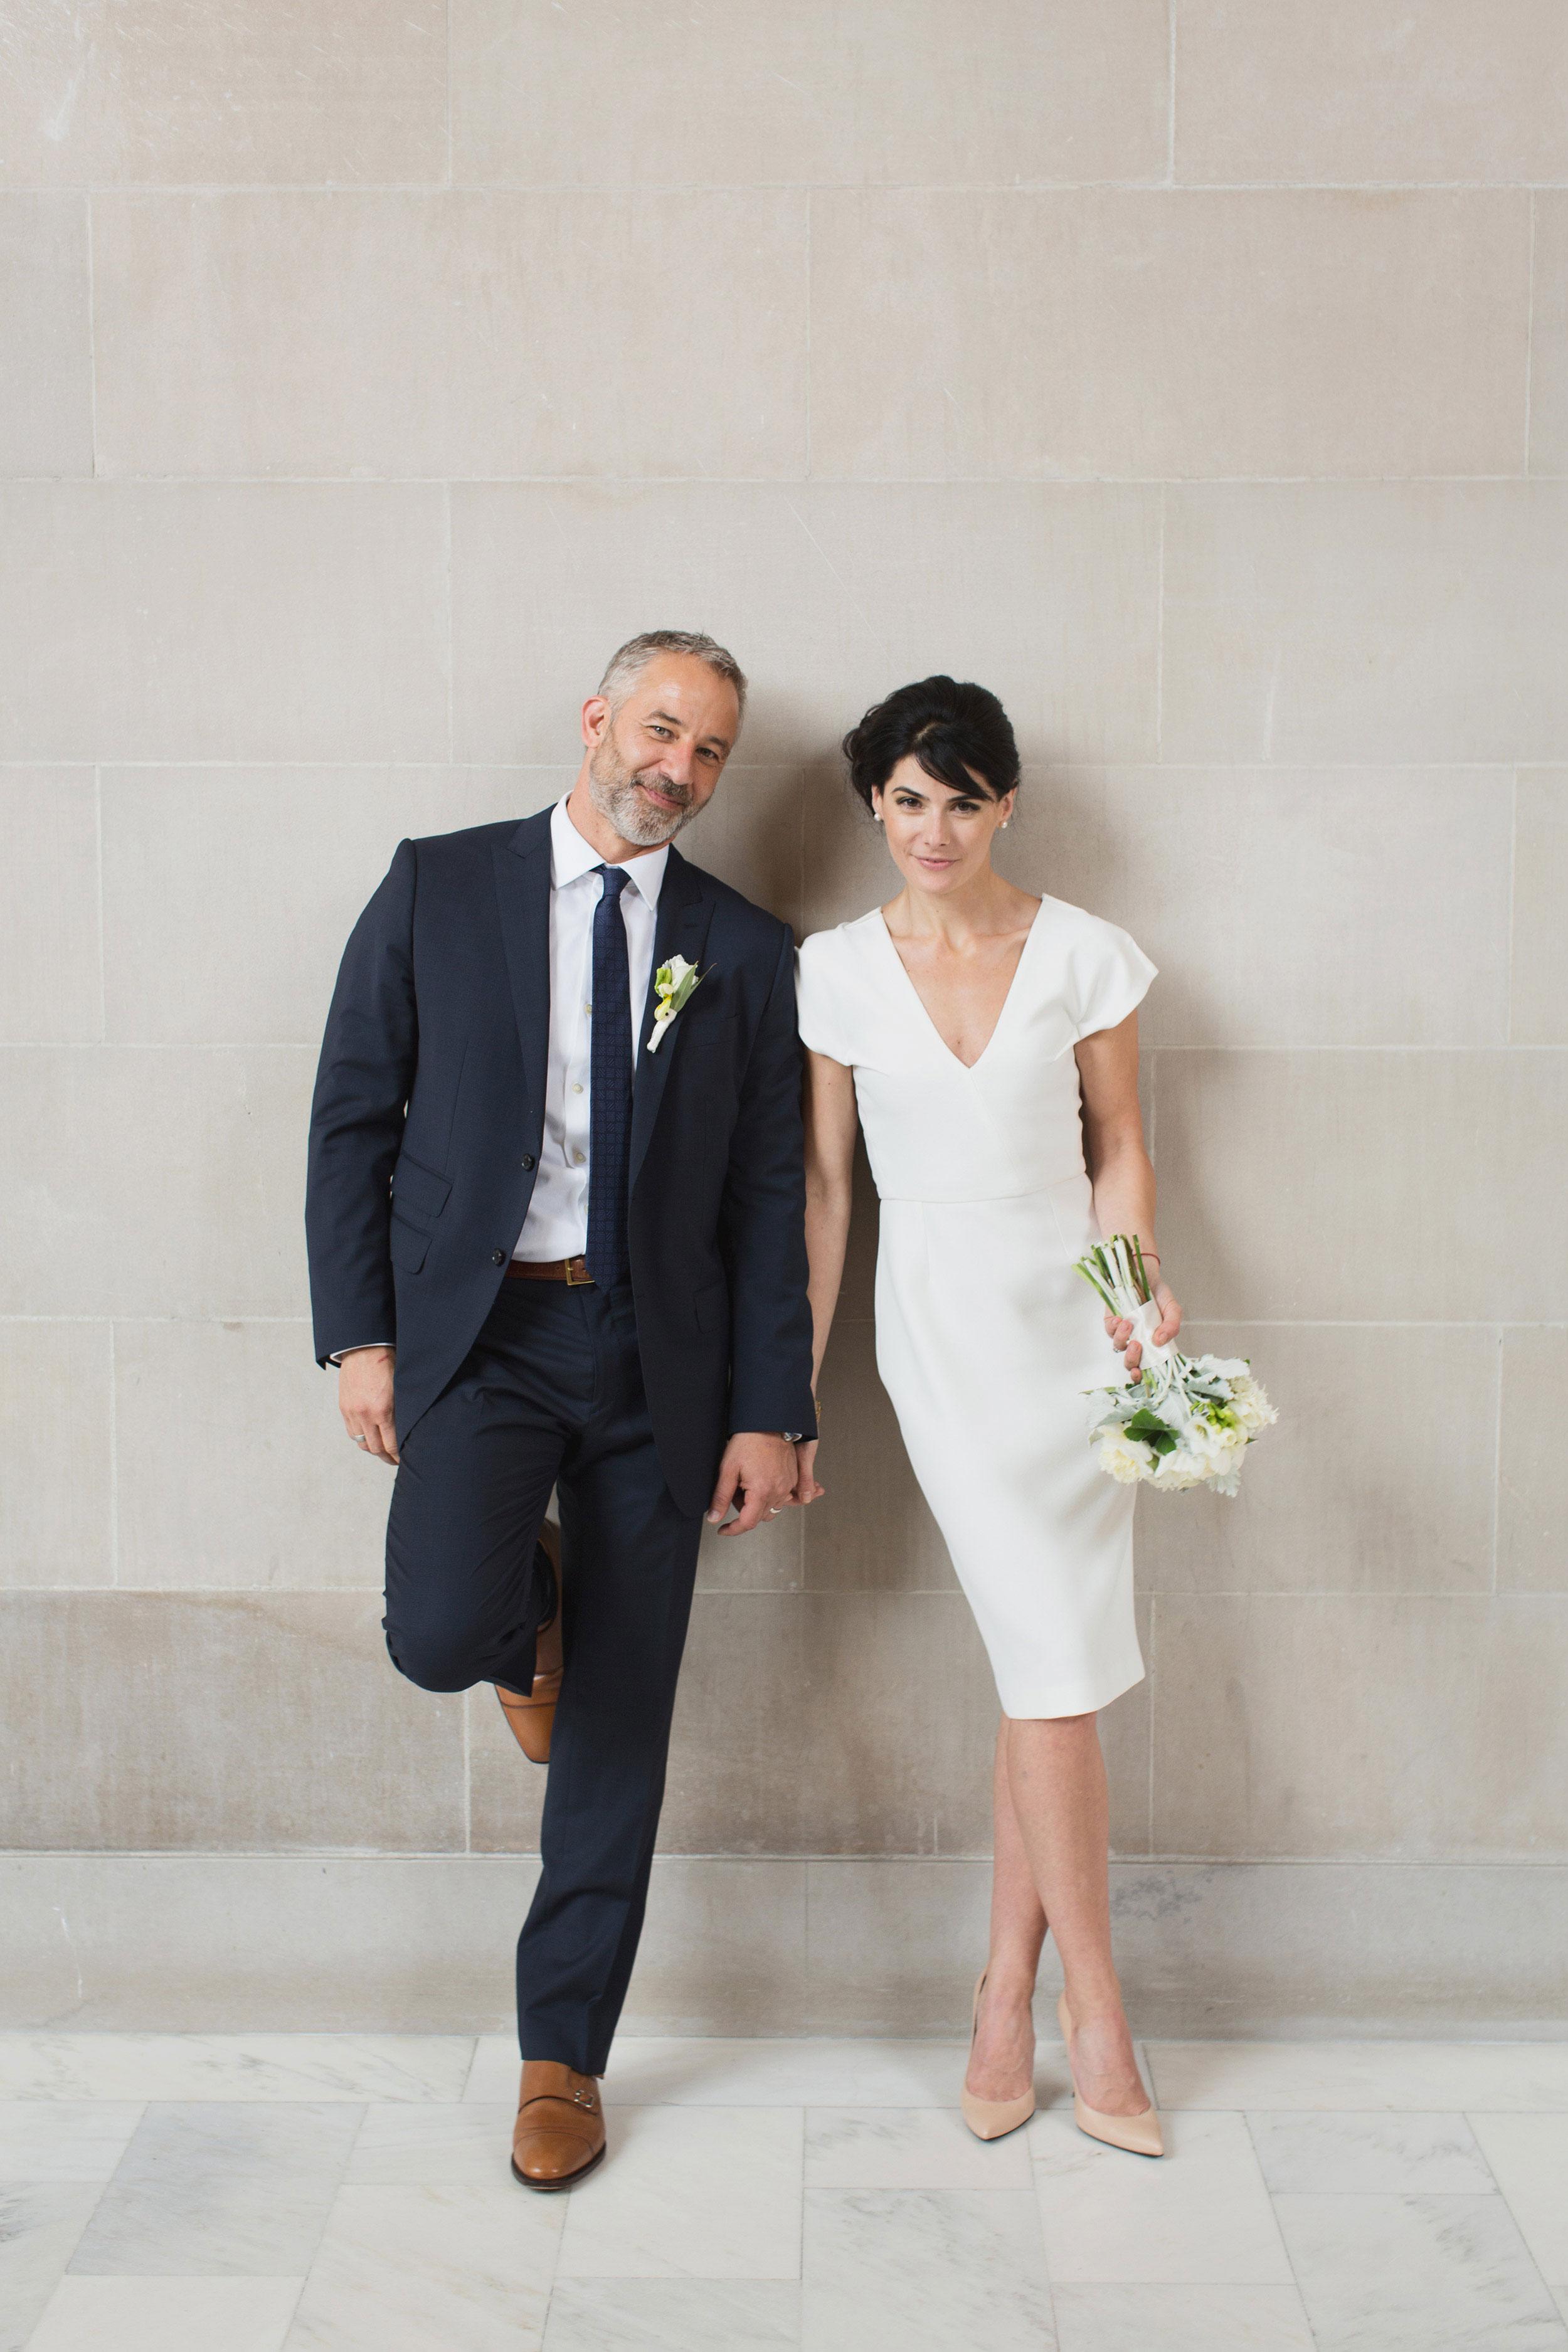 Modern Bride and groom at San Francisco City Hall